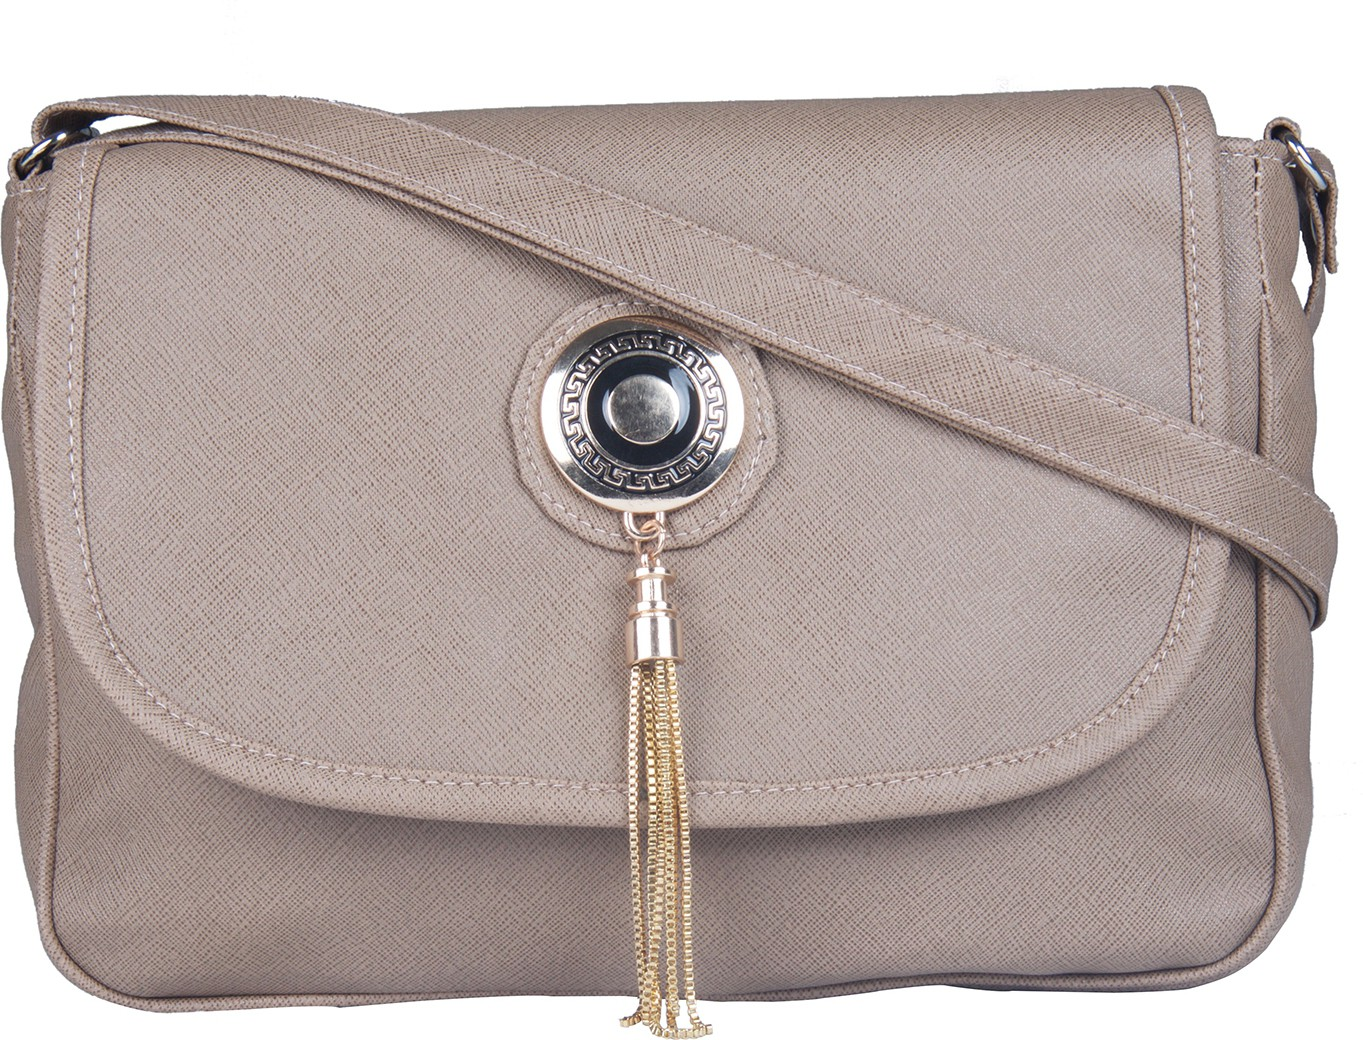 Sling bag below 500 - Craze On Bags Women Beige Pu Sling Bag